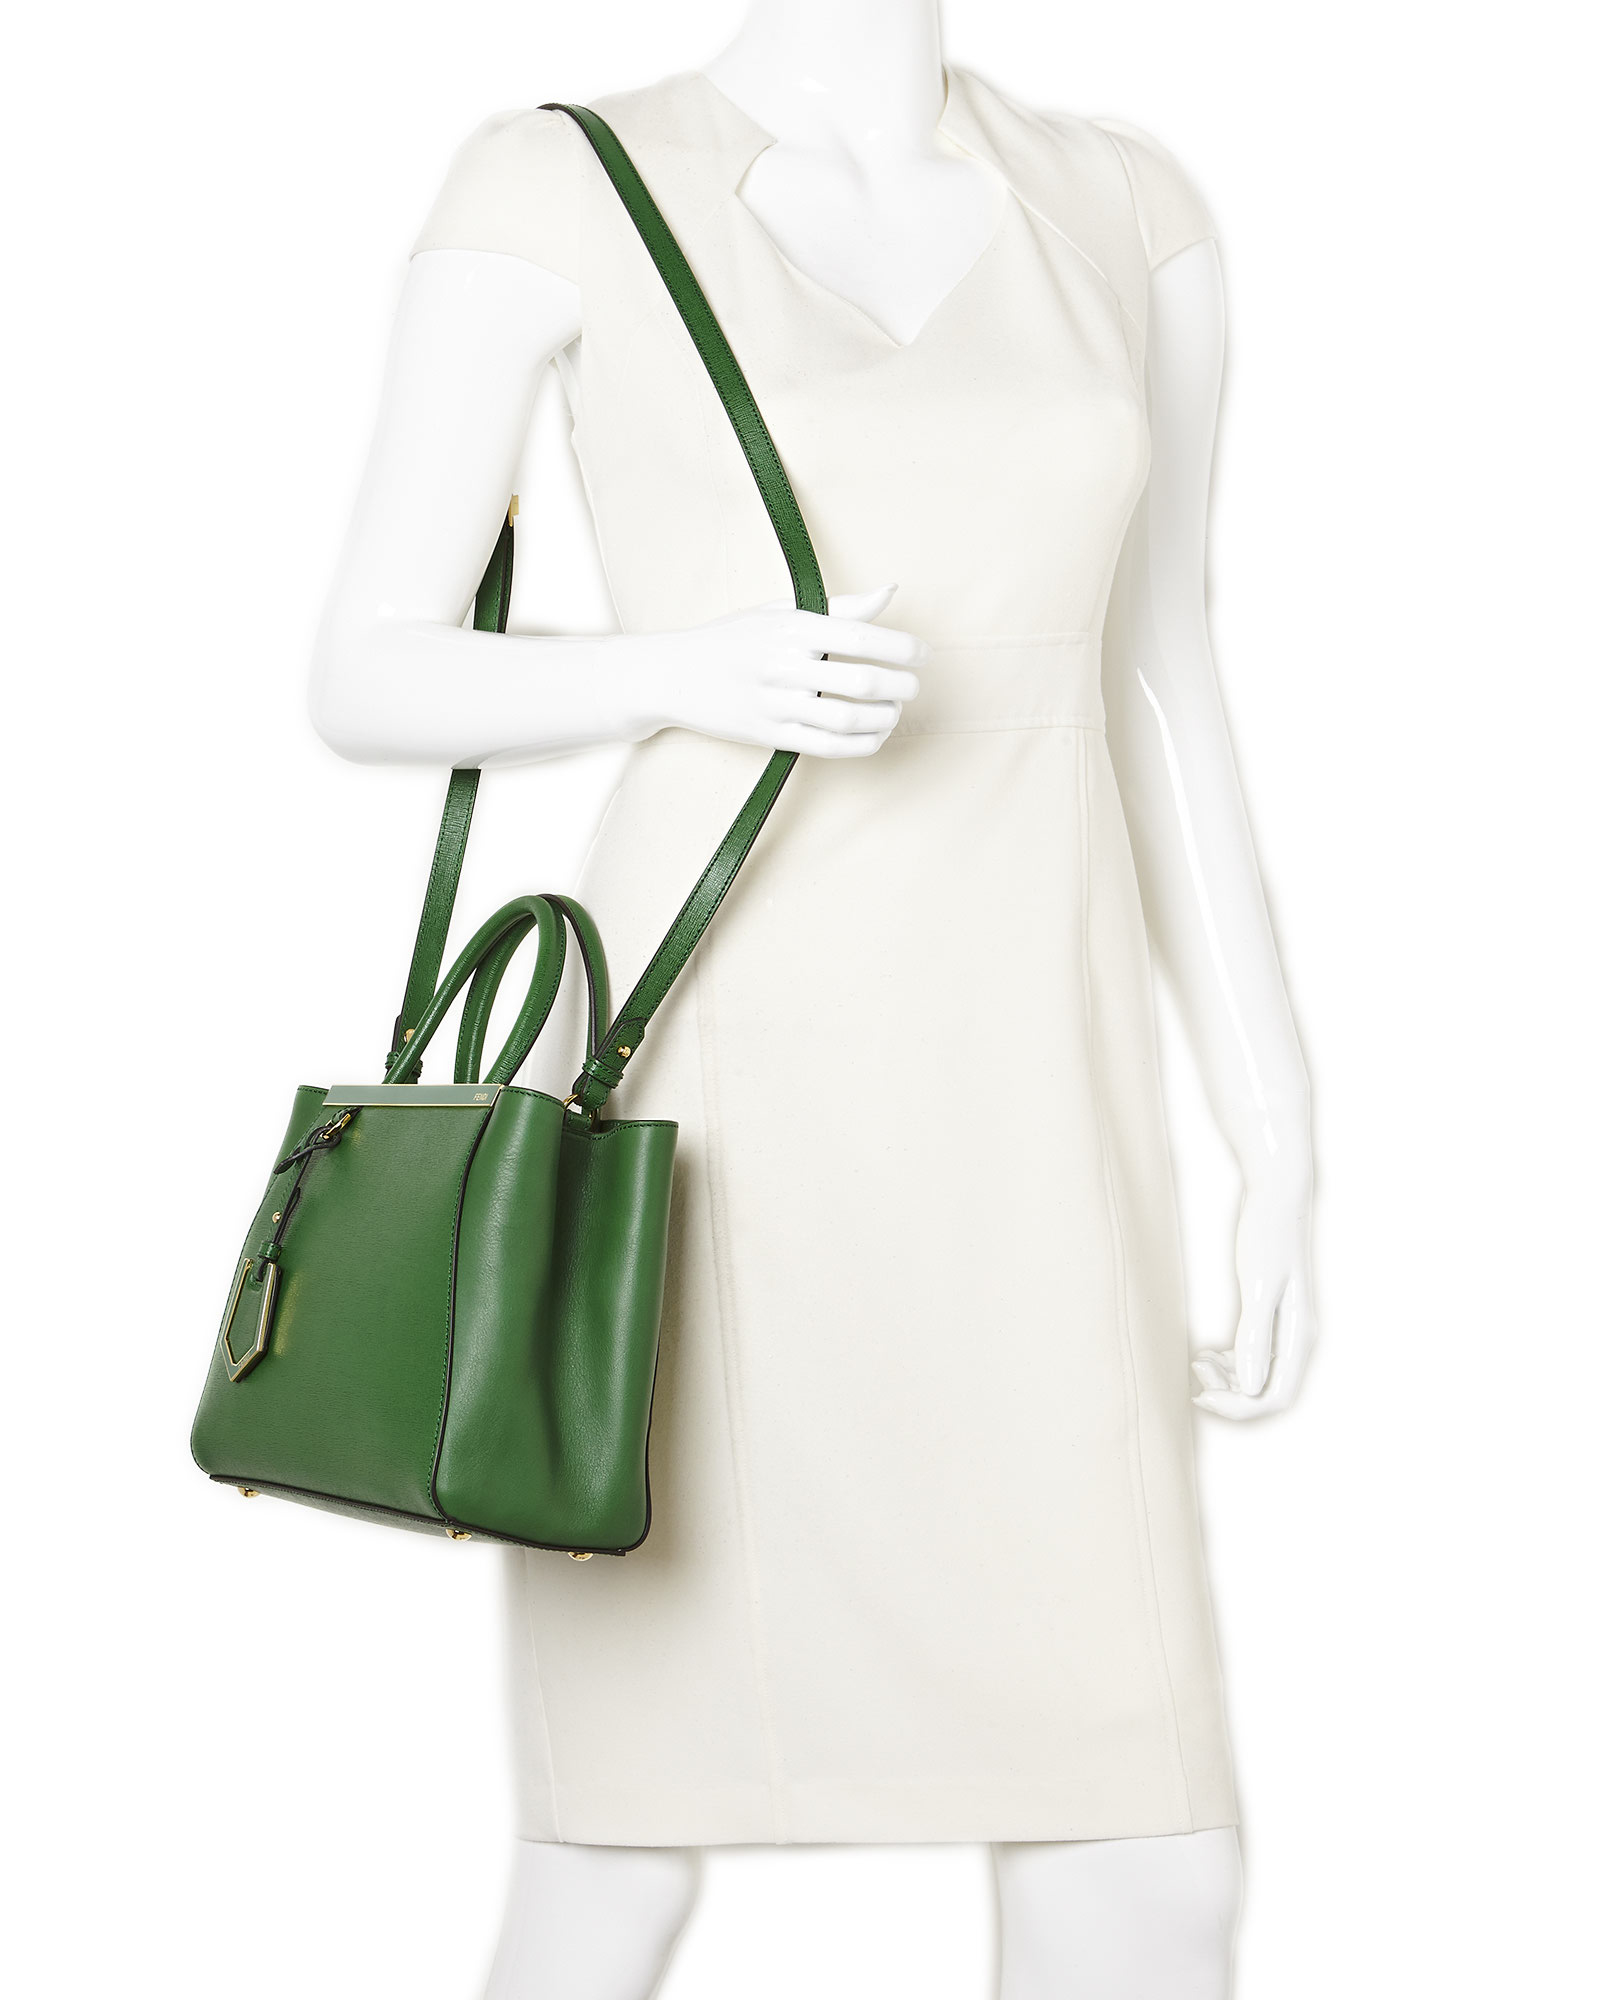 0cb8226c2c62 ... best price lyst fendi emerald green petite 2jours tote in green 19411  9b425 canada fendi 2jours leather ...